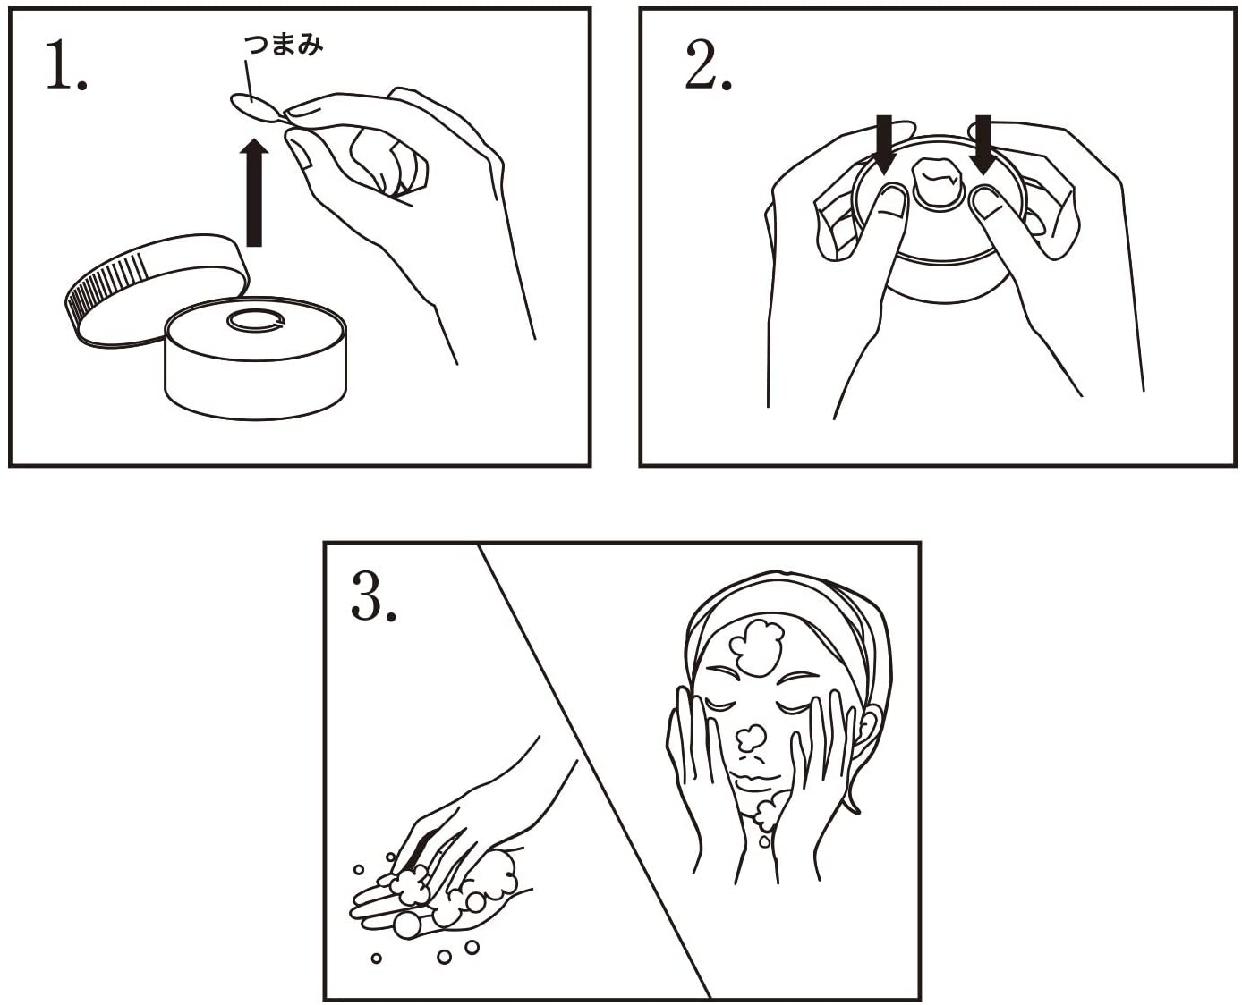 ROSETTE(ロゼット) 洗顔パスタ 普通肌の商品画像7